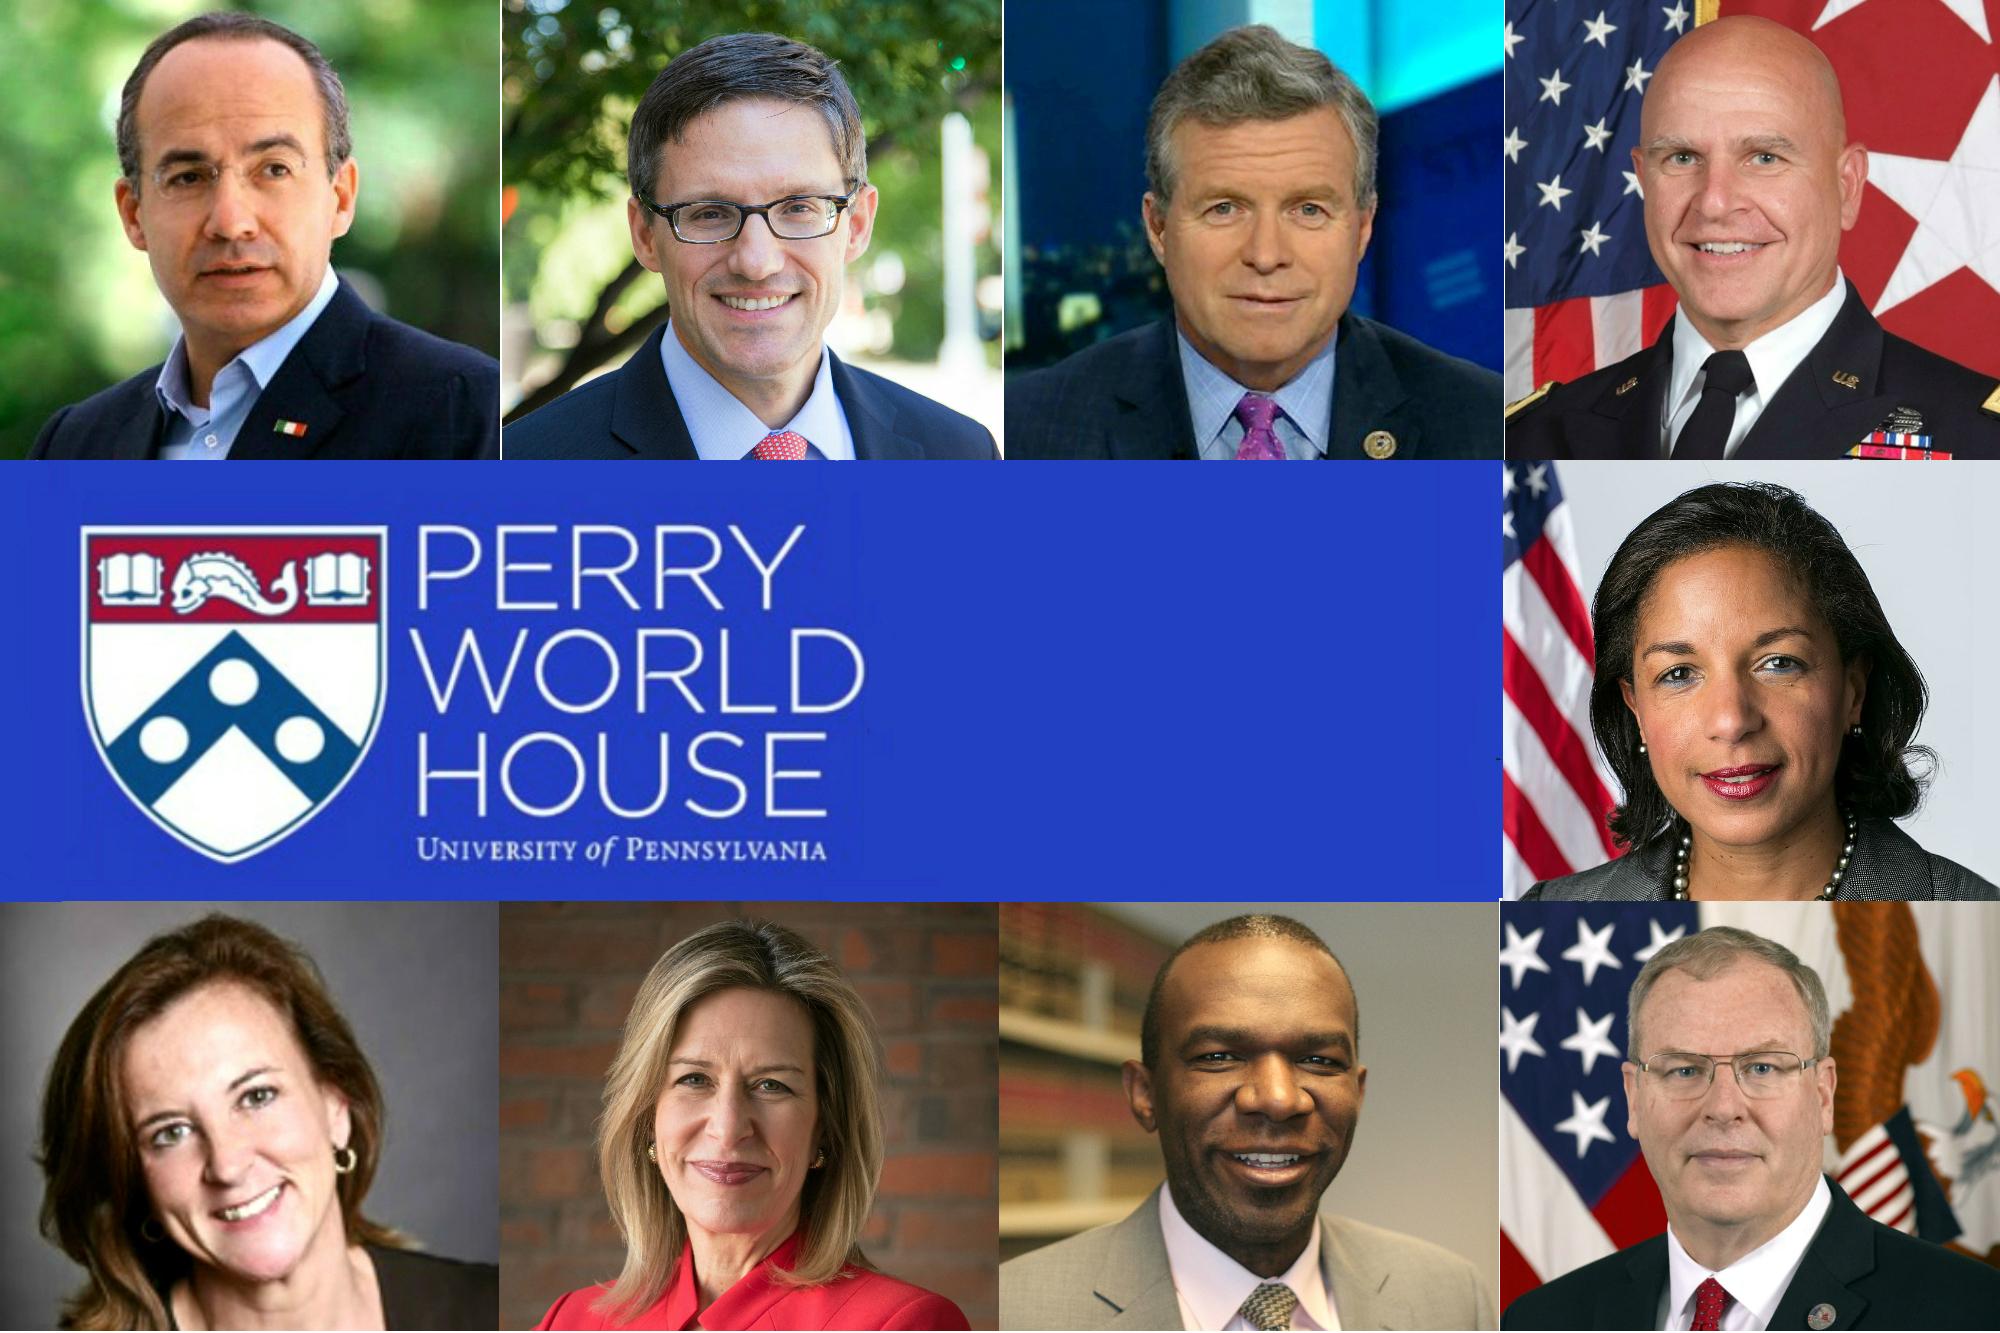 University of Pennsylvania Announces 2018-2019 Perry World House Fellows